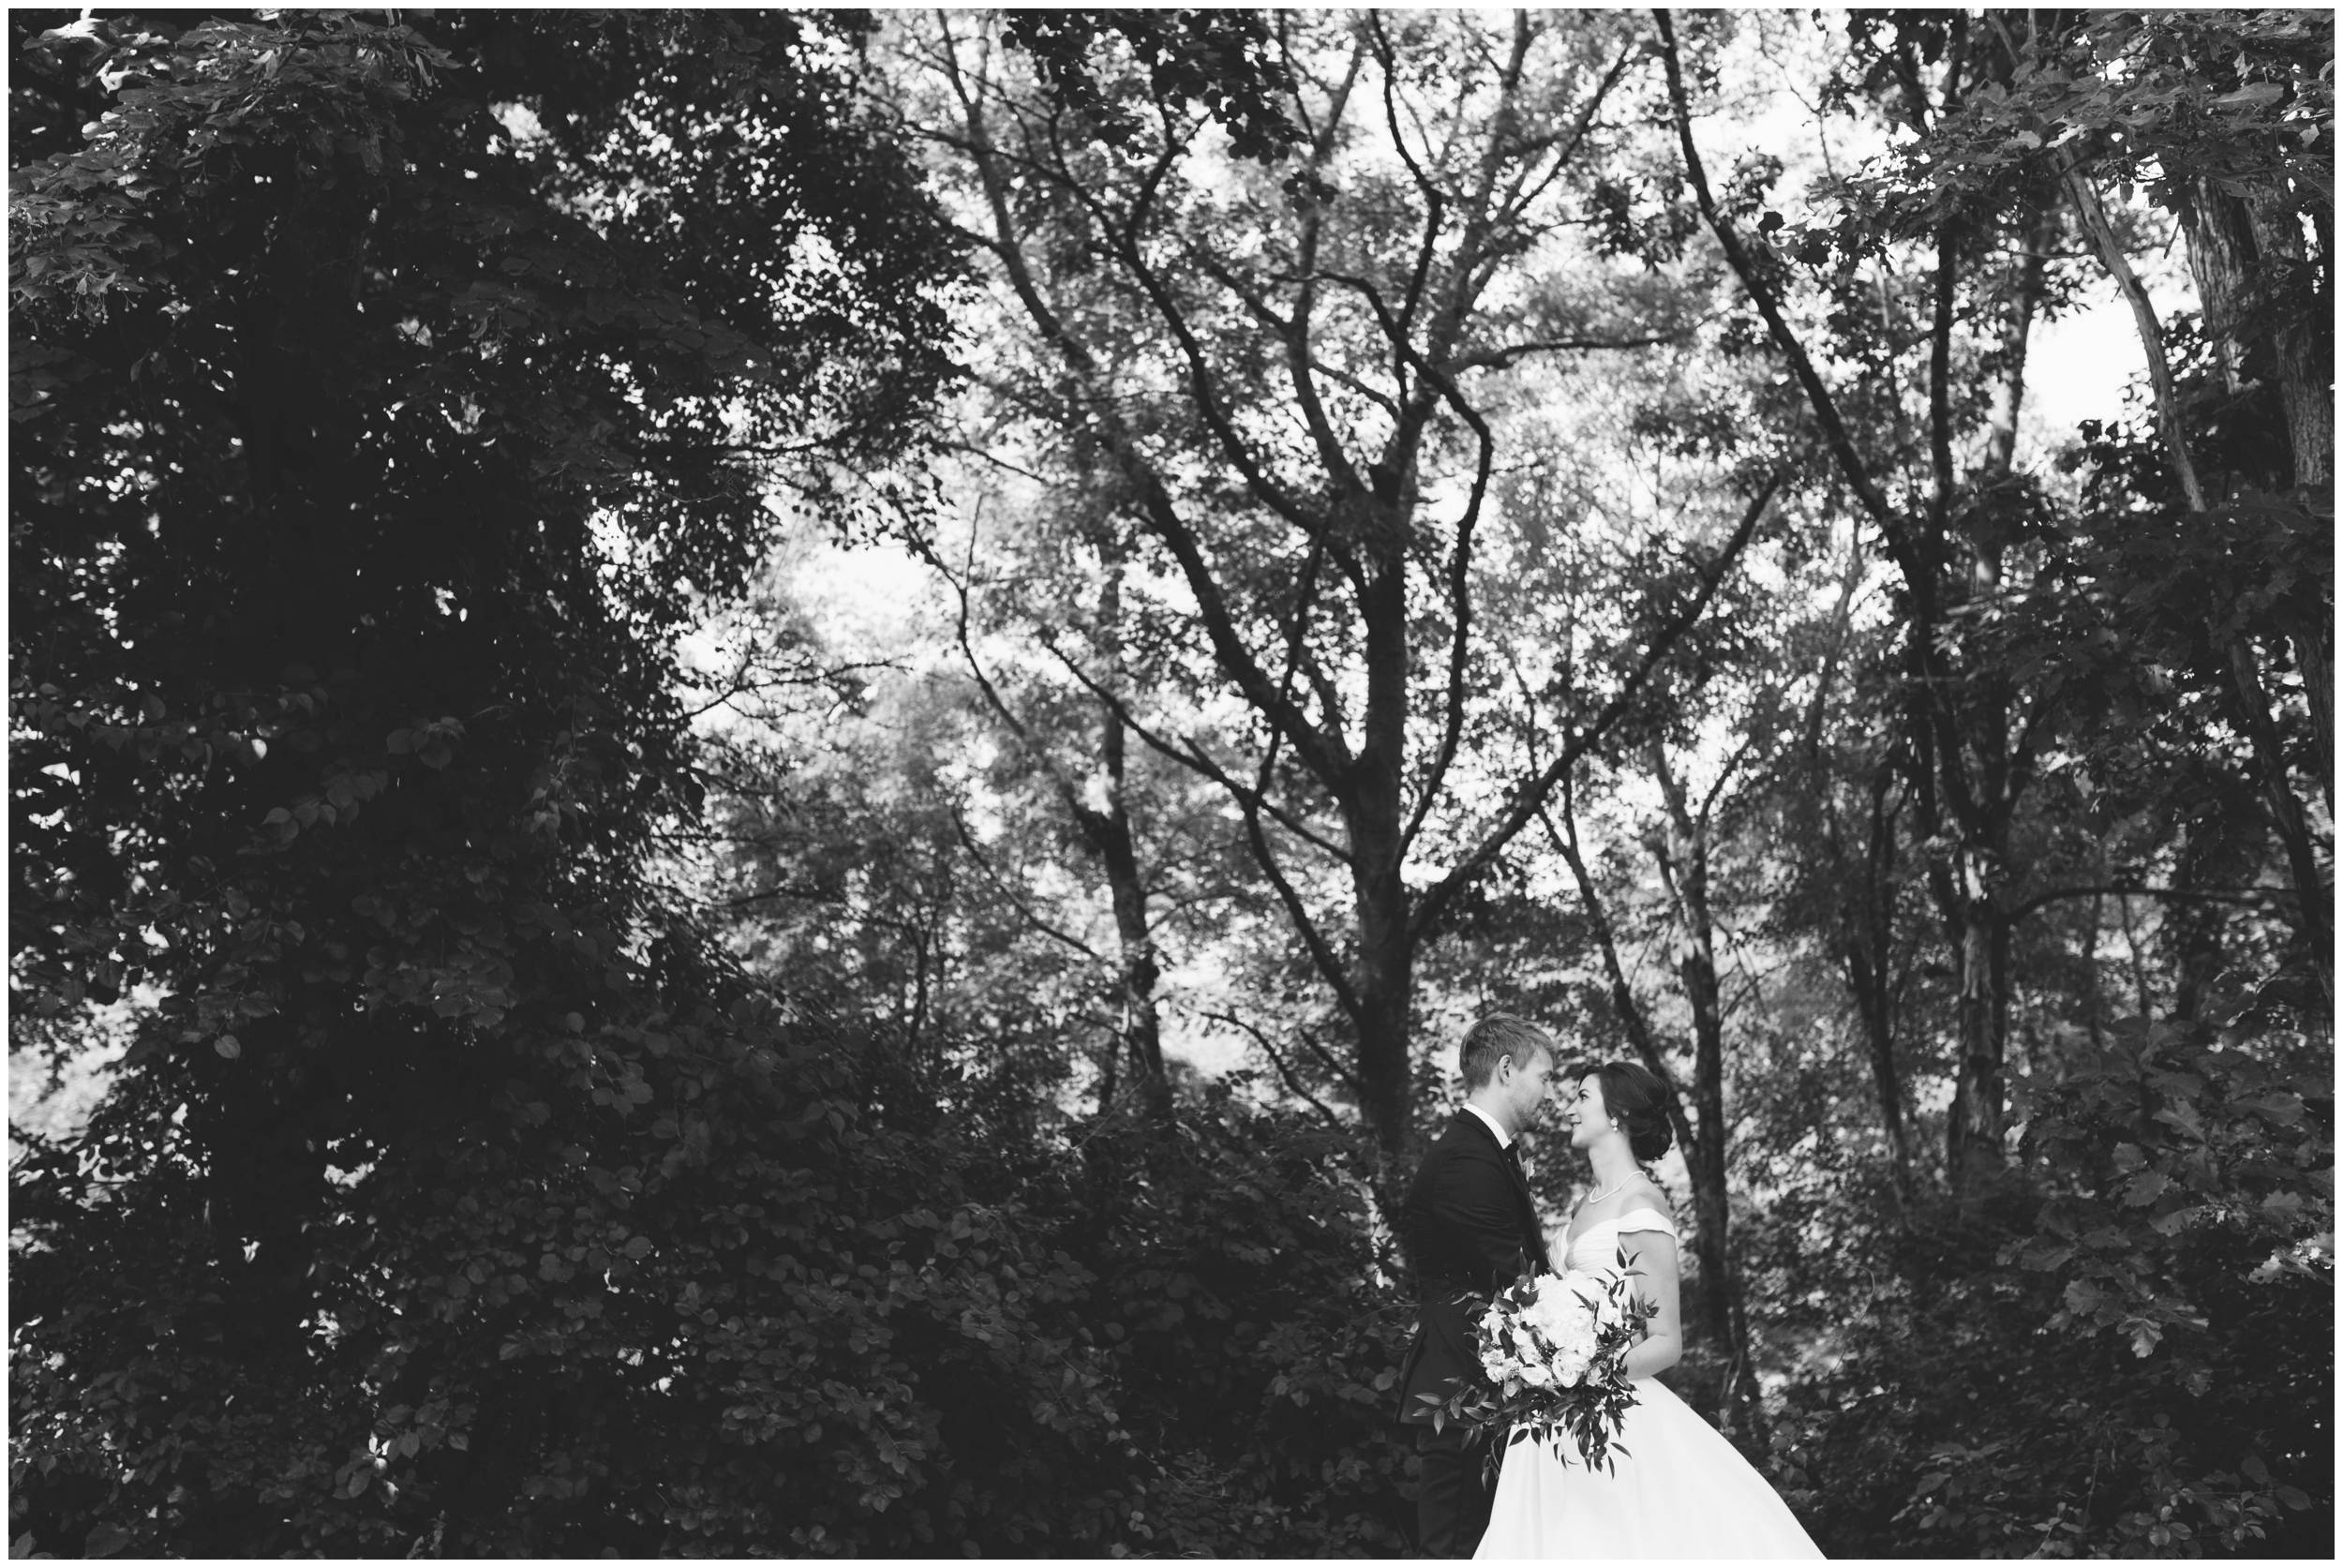 Willowdale-Estate-Wedding-Bailey-Q-Photo-Boston-Wedding-Photographer-016.JPG